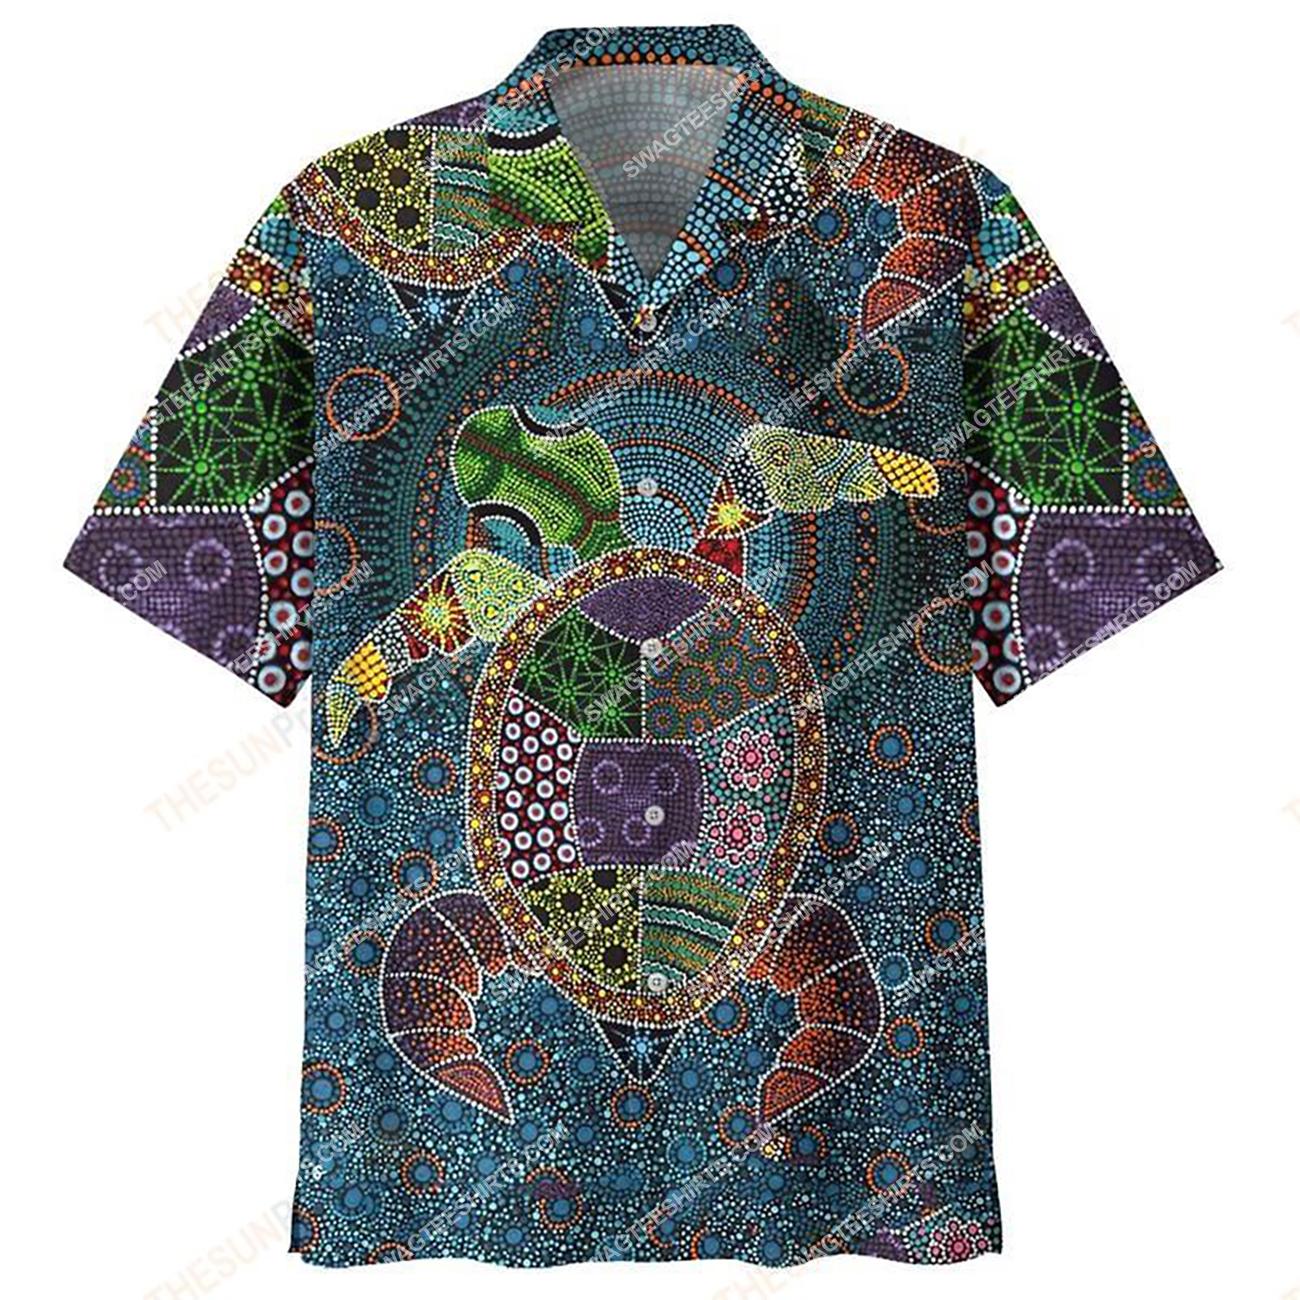 vintage sea turtle all over printed hawaiian shirt 1(2) - Copy